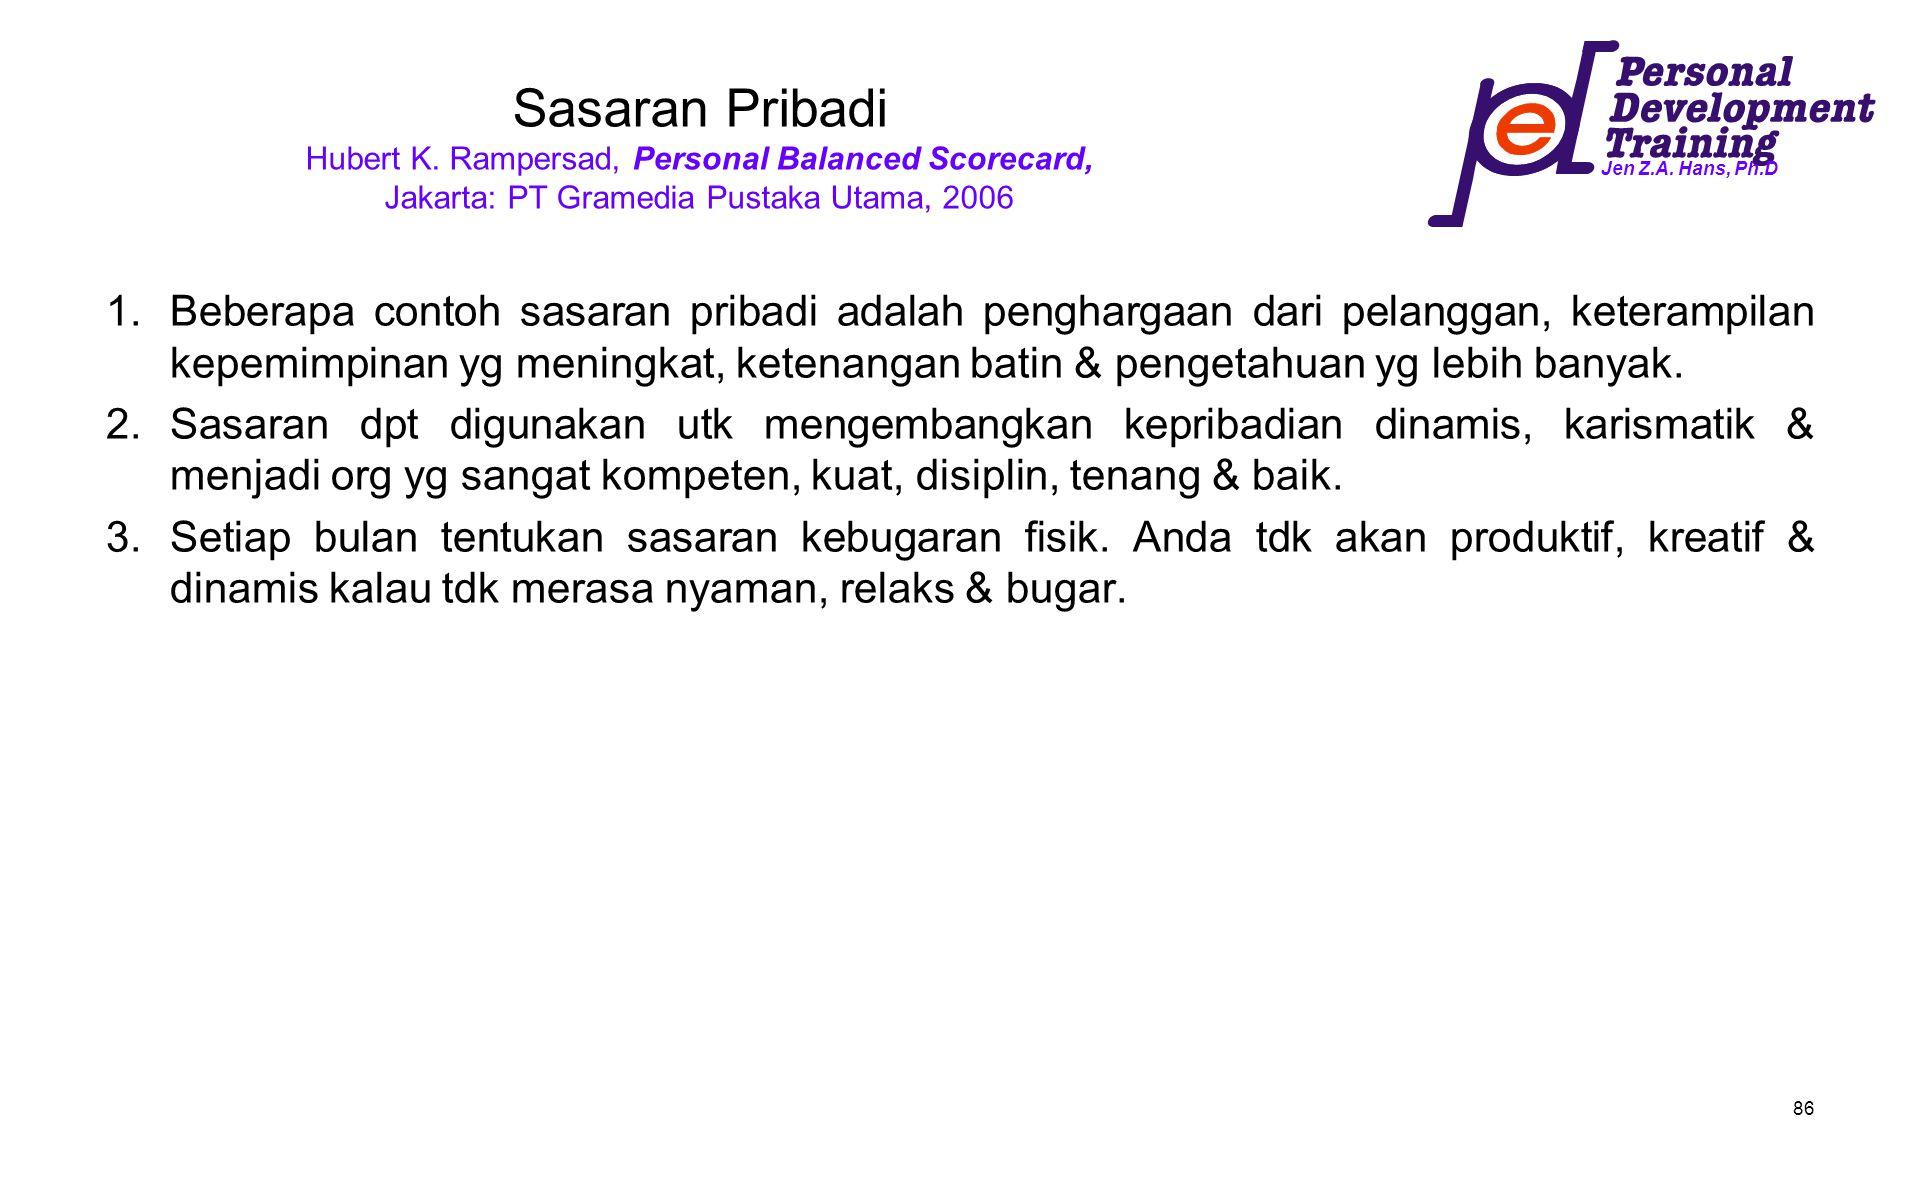 Jen Z.A. Hans, Ph.D 86 Sasaran Pribadi Hubert K. Rampersad, Personal Balanced Scorecard, Jakarta: PT Gramedia Pustaka Utama, 2006 1.Beberapa contoh sa